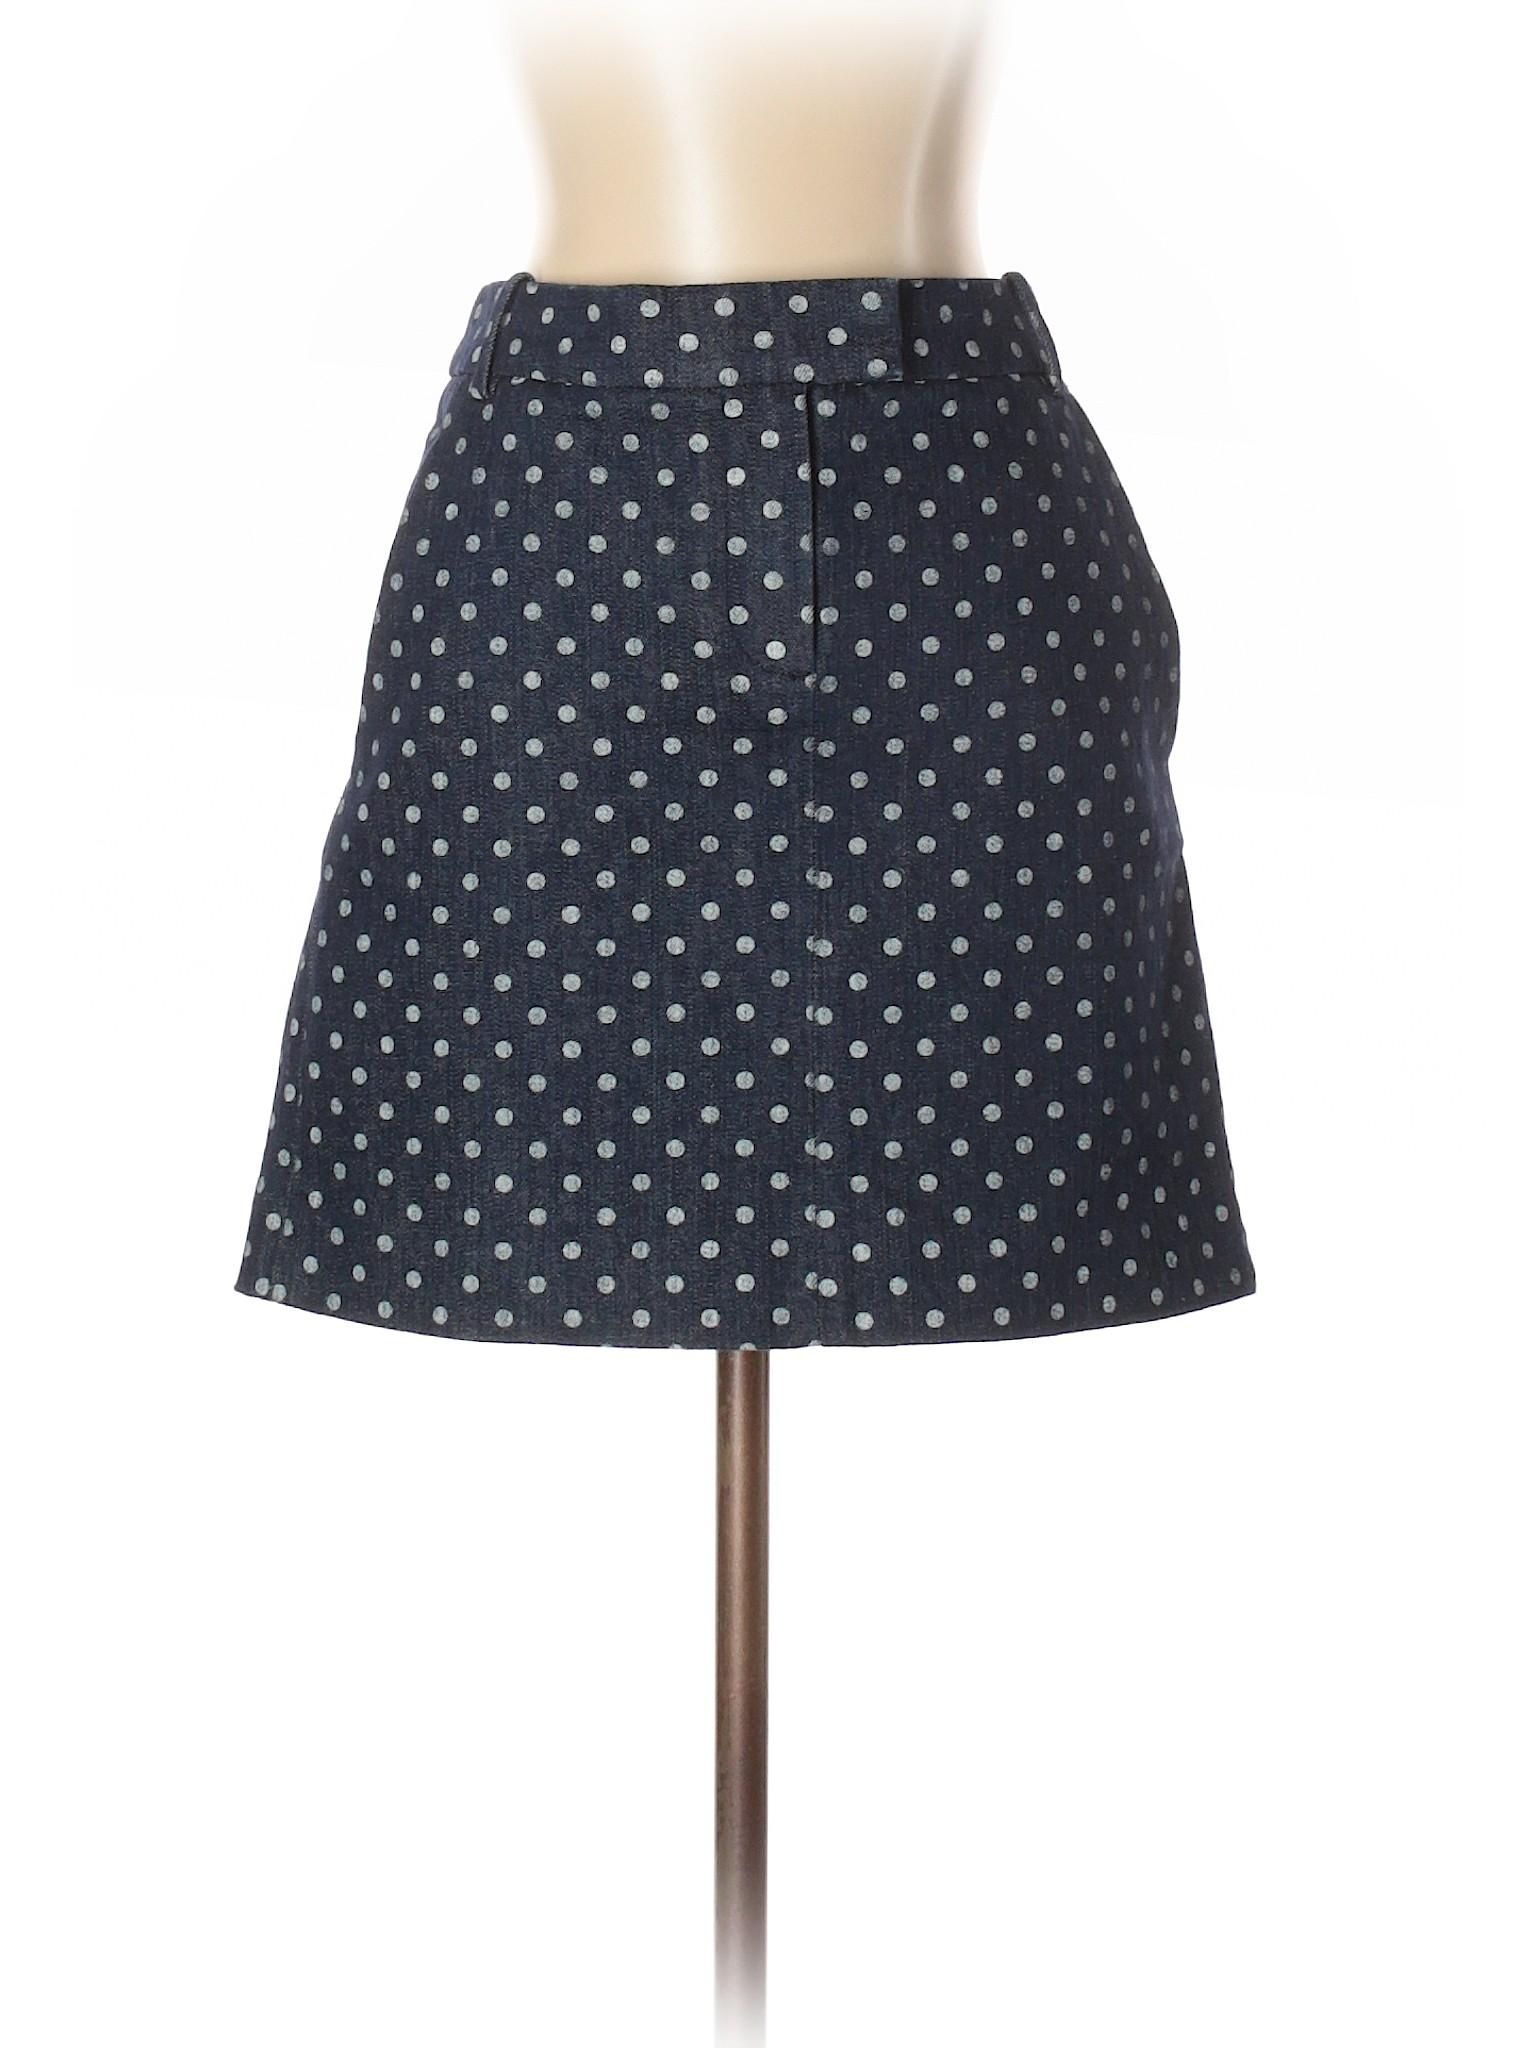 Denim Boutique Denim Skirt Boutique xvwIE18